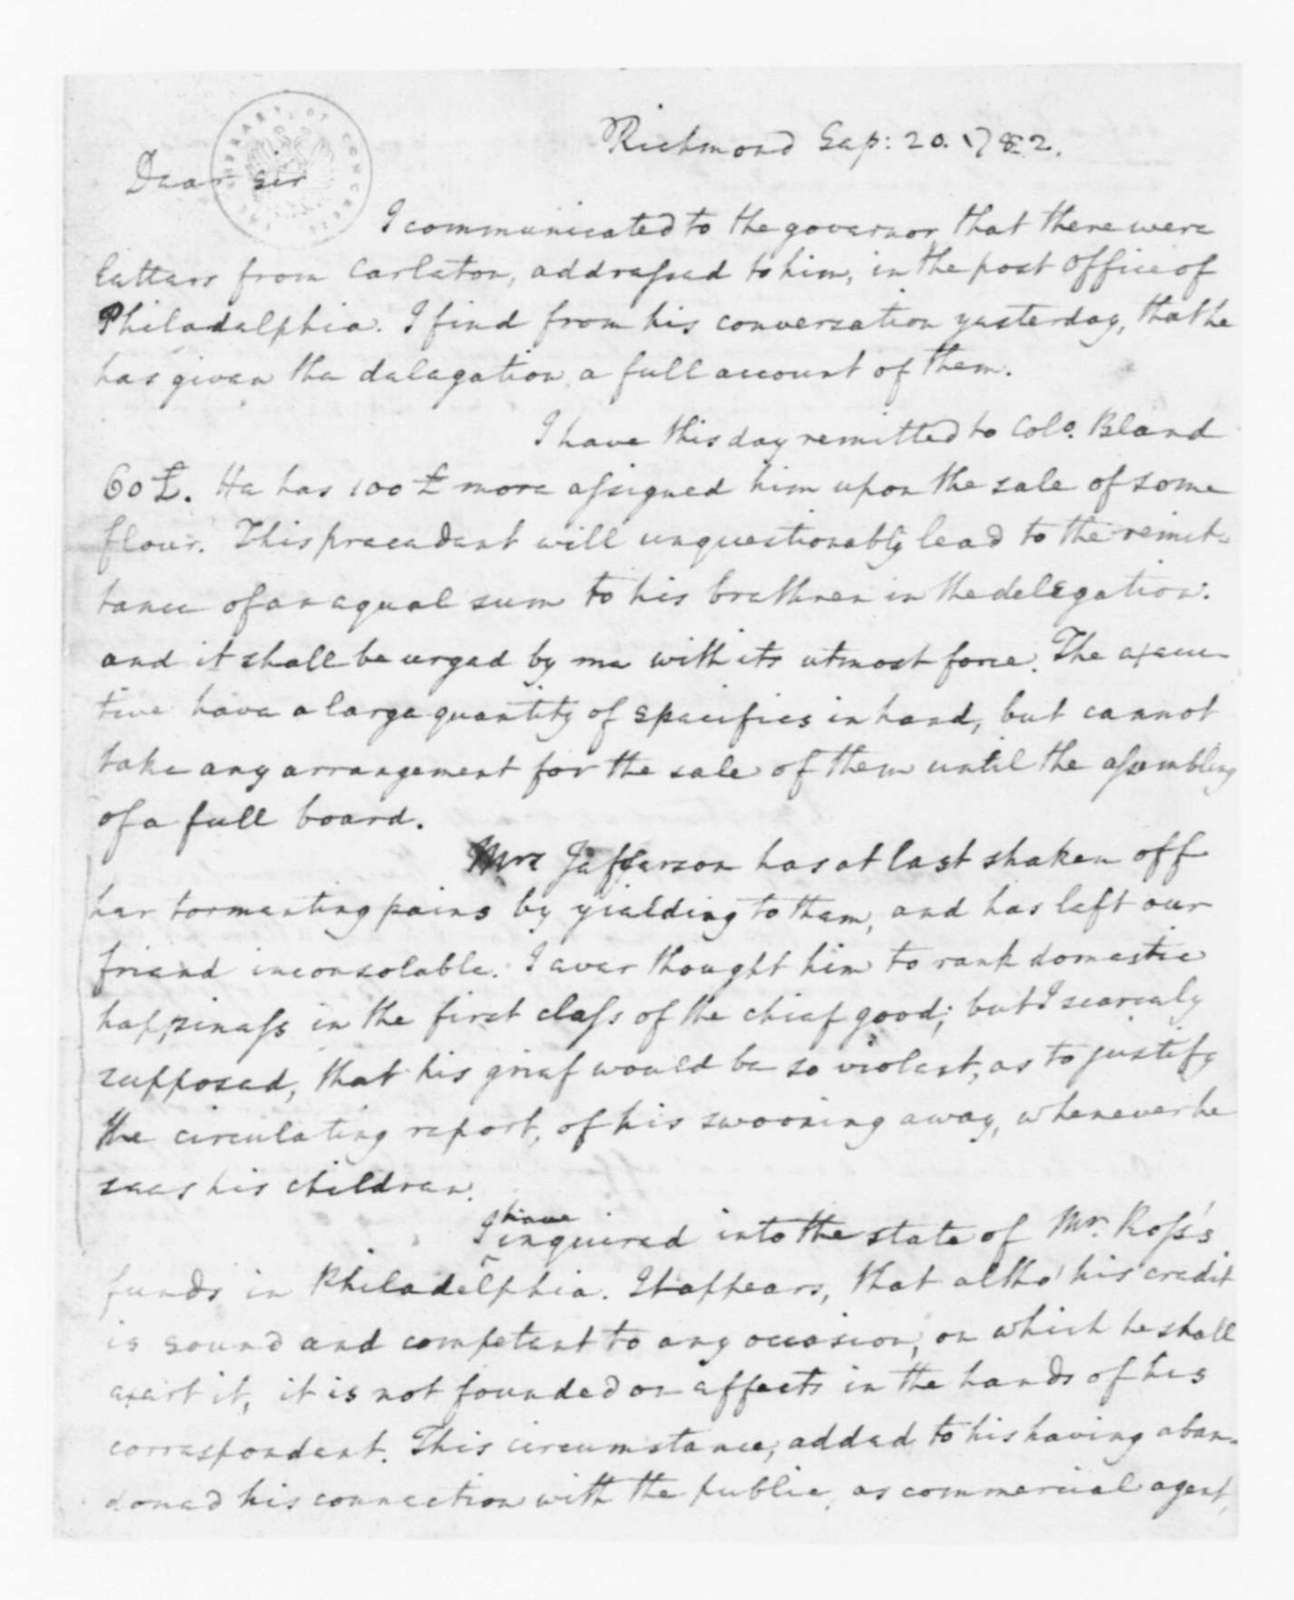 Edmund Randolph to James Madison, September 26, 1782.